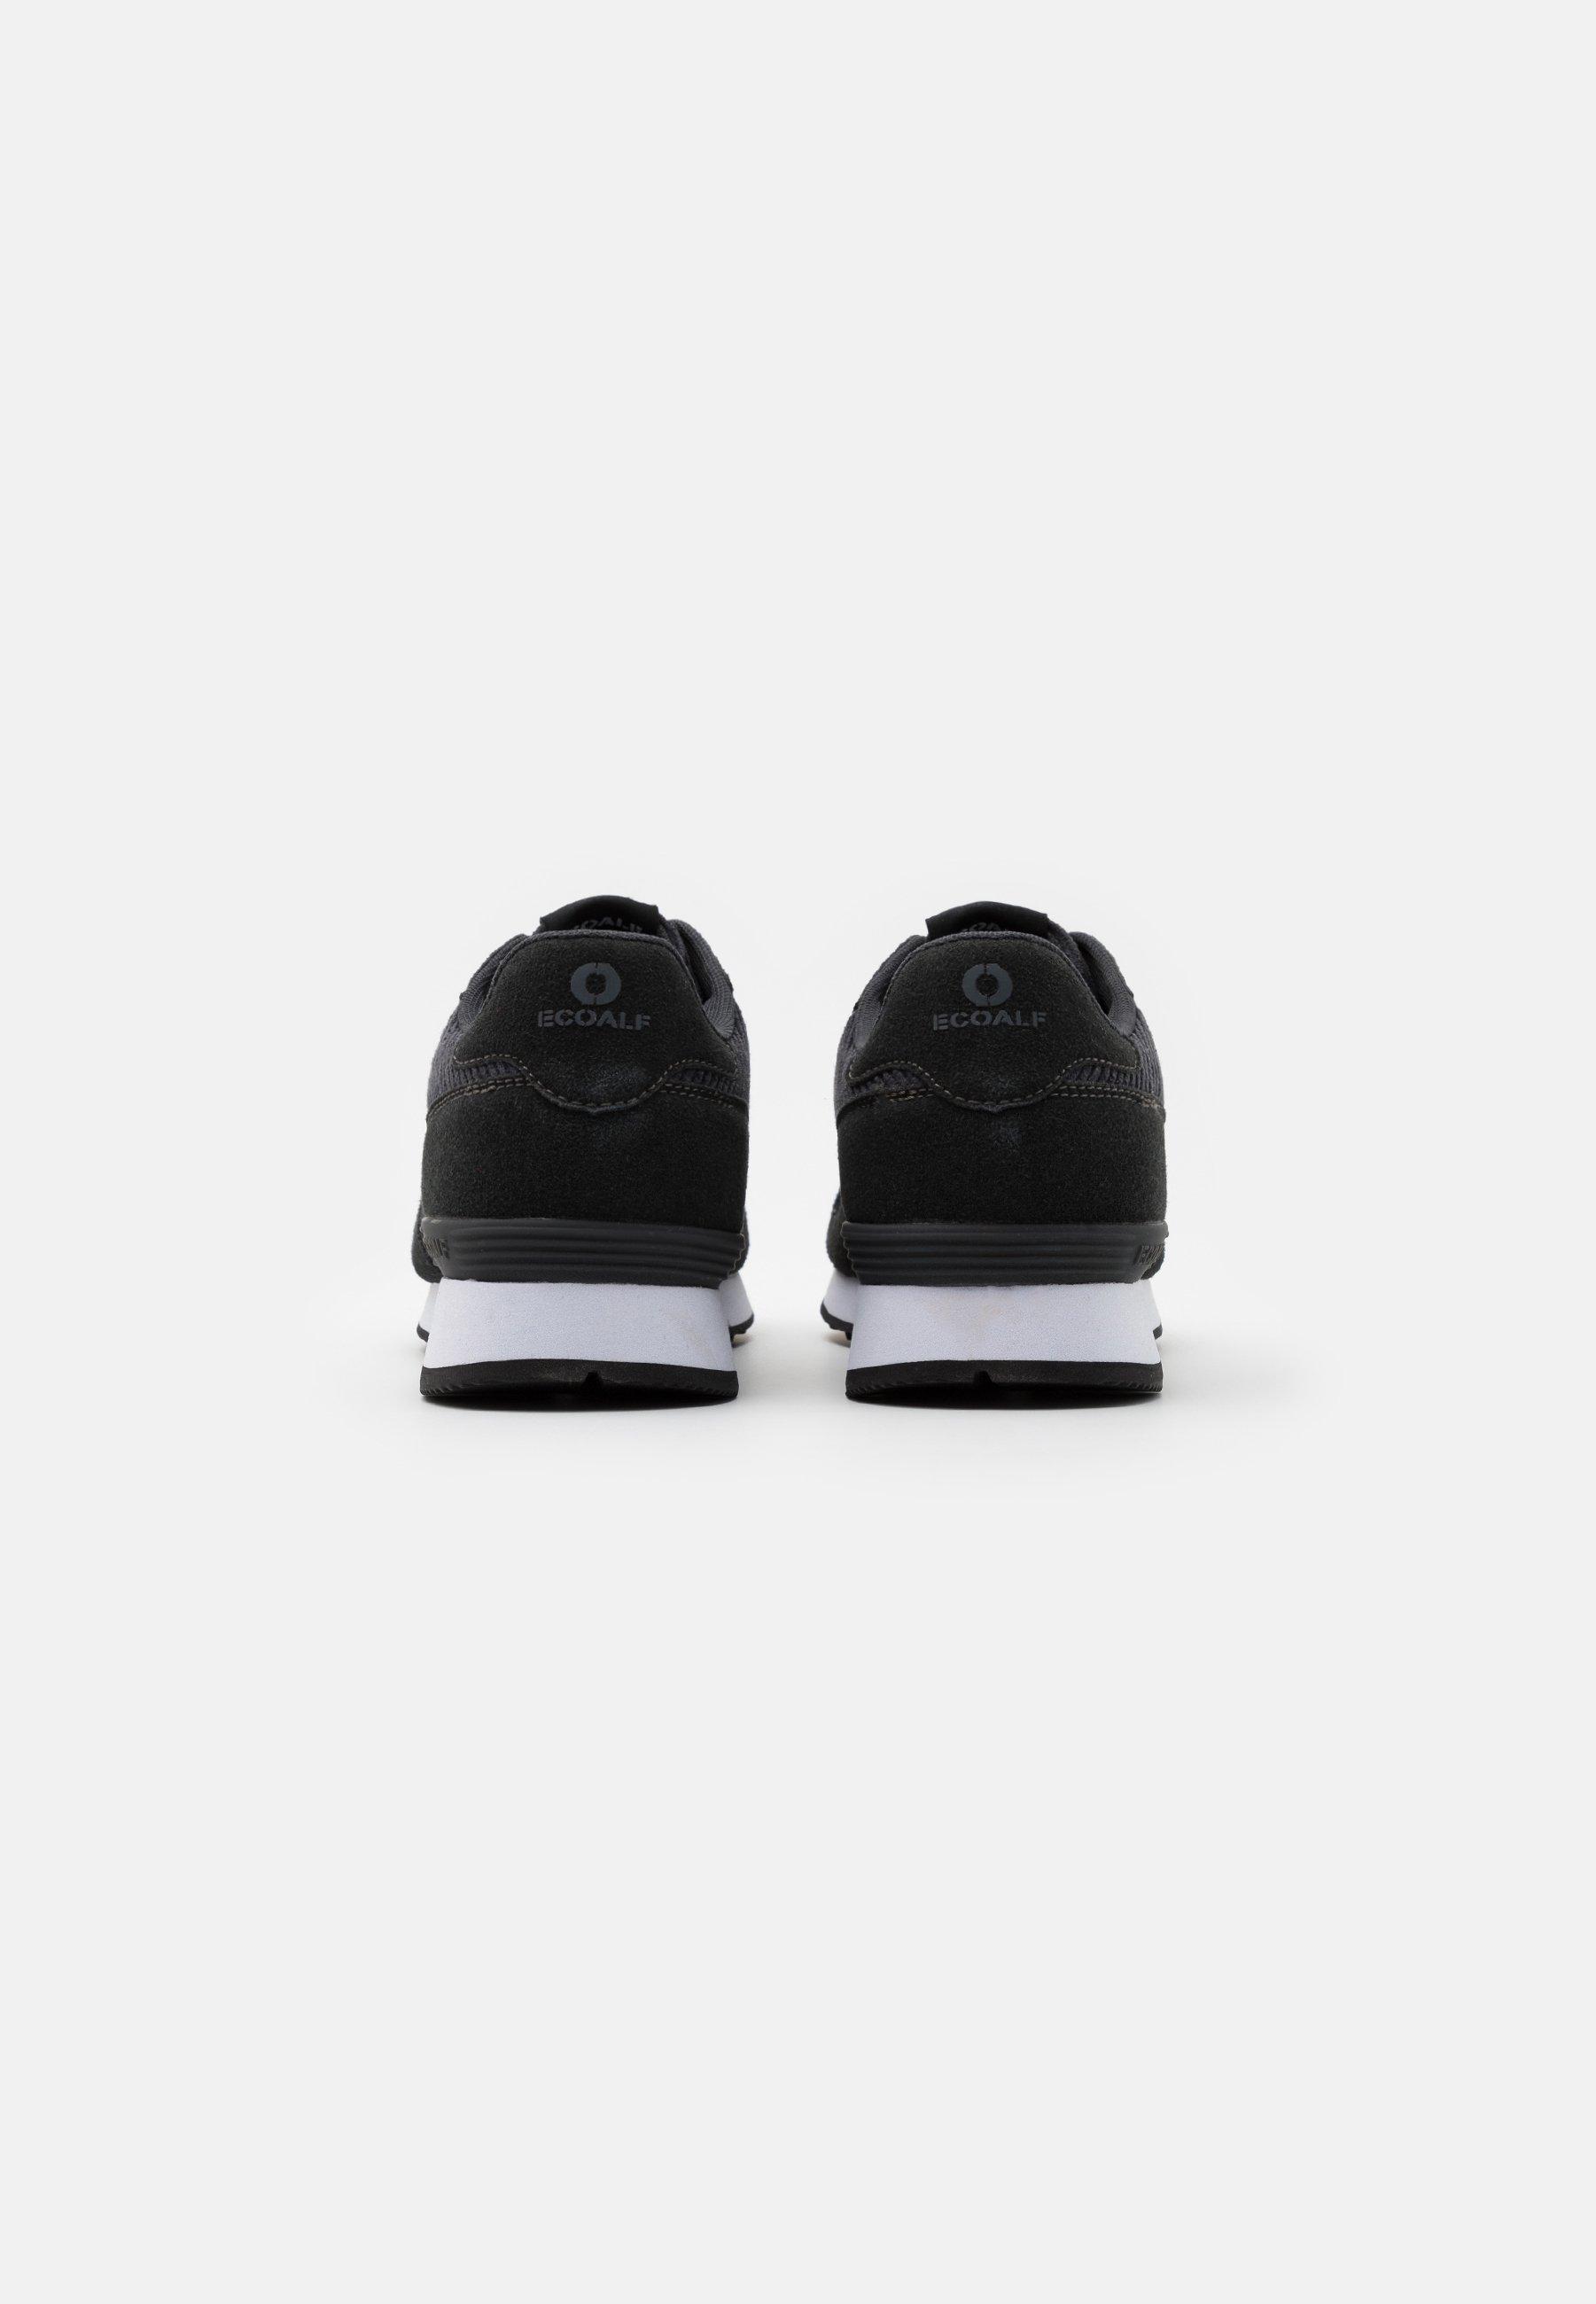 Ecoalf PANA YALE MAN - Sneaker low - caviar/schwarz - Herrenschuhe C17zW